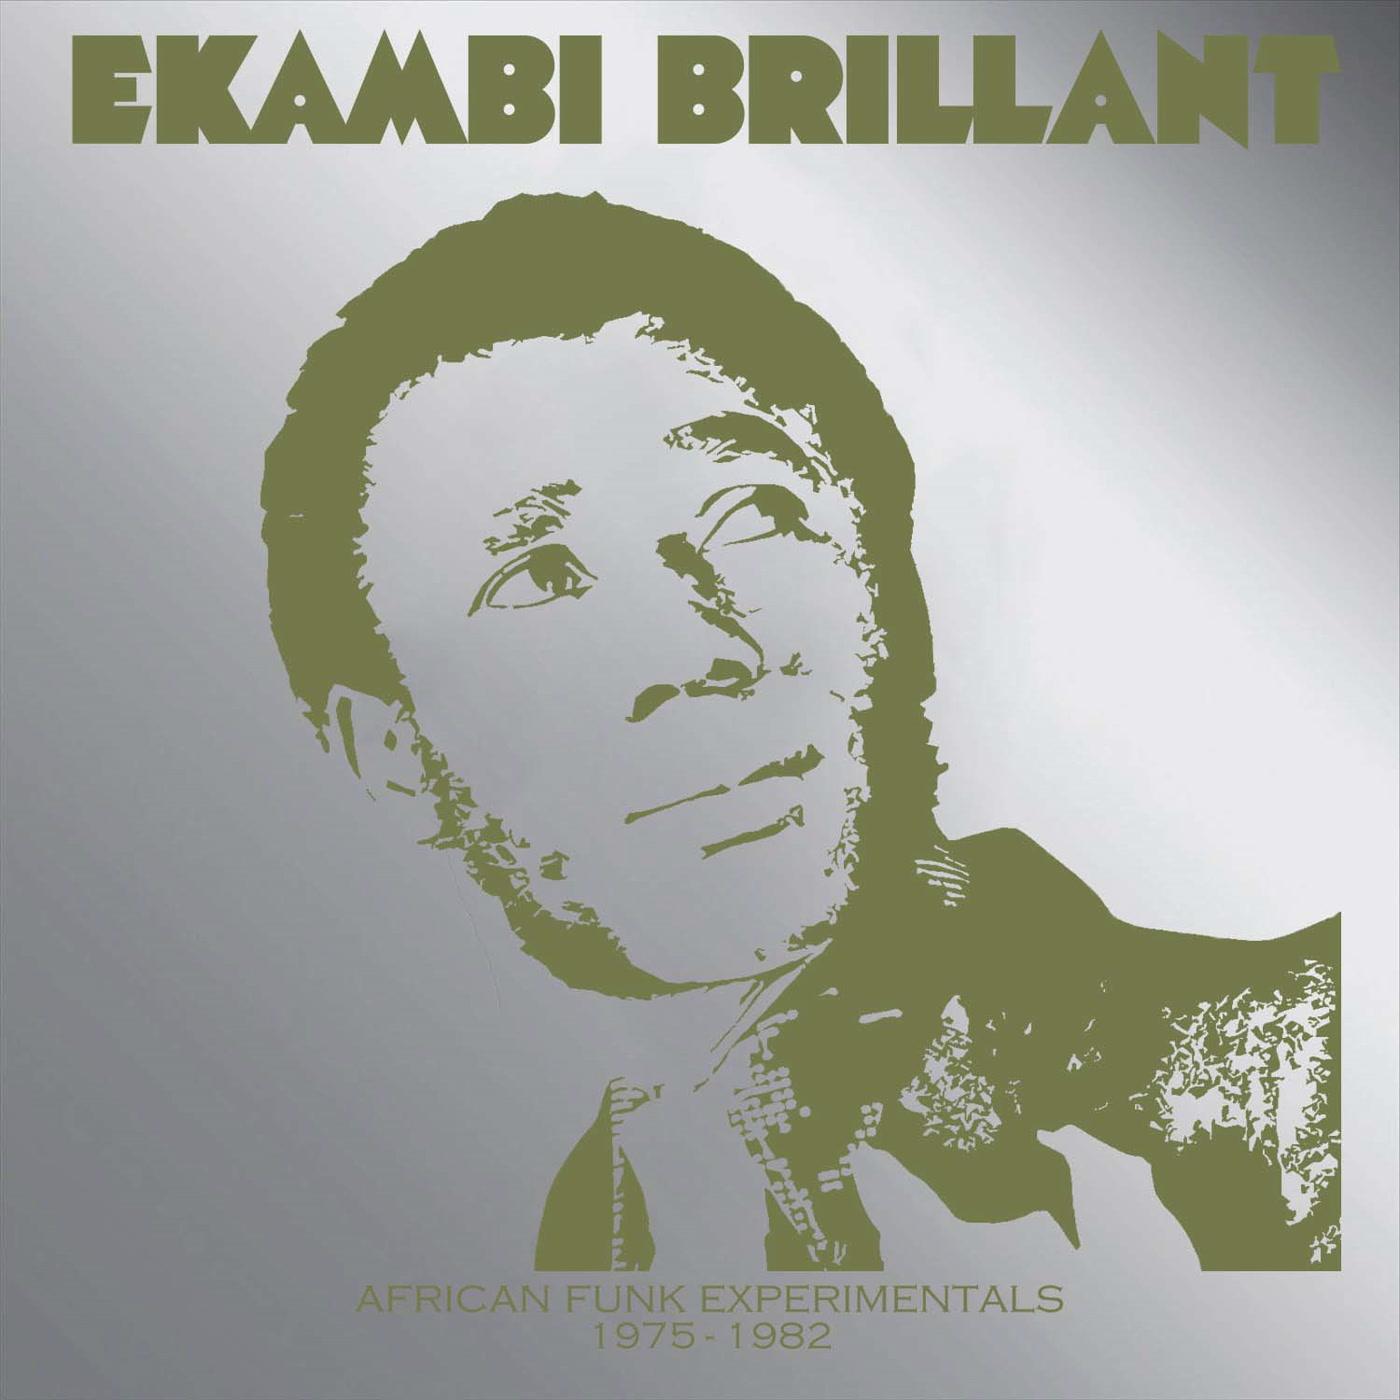 Image result for ekambi brillant africa africa